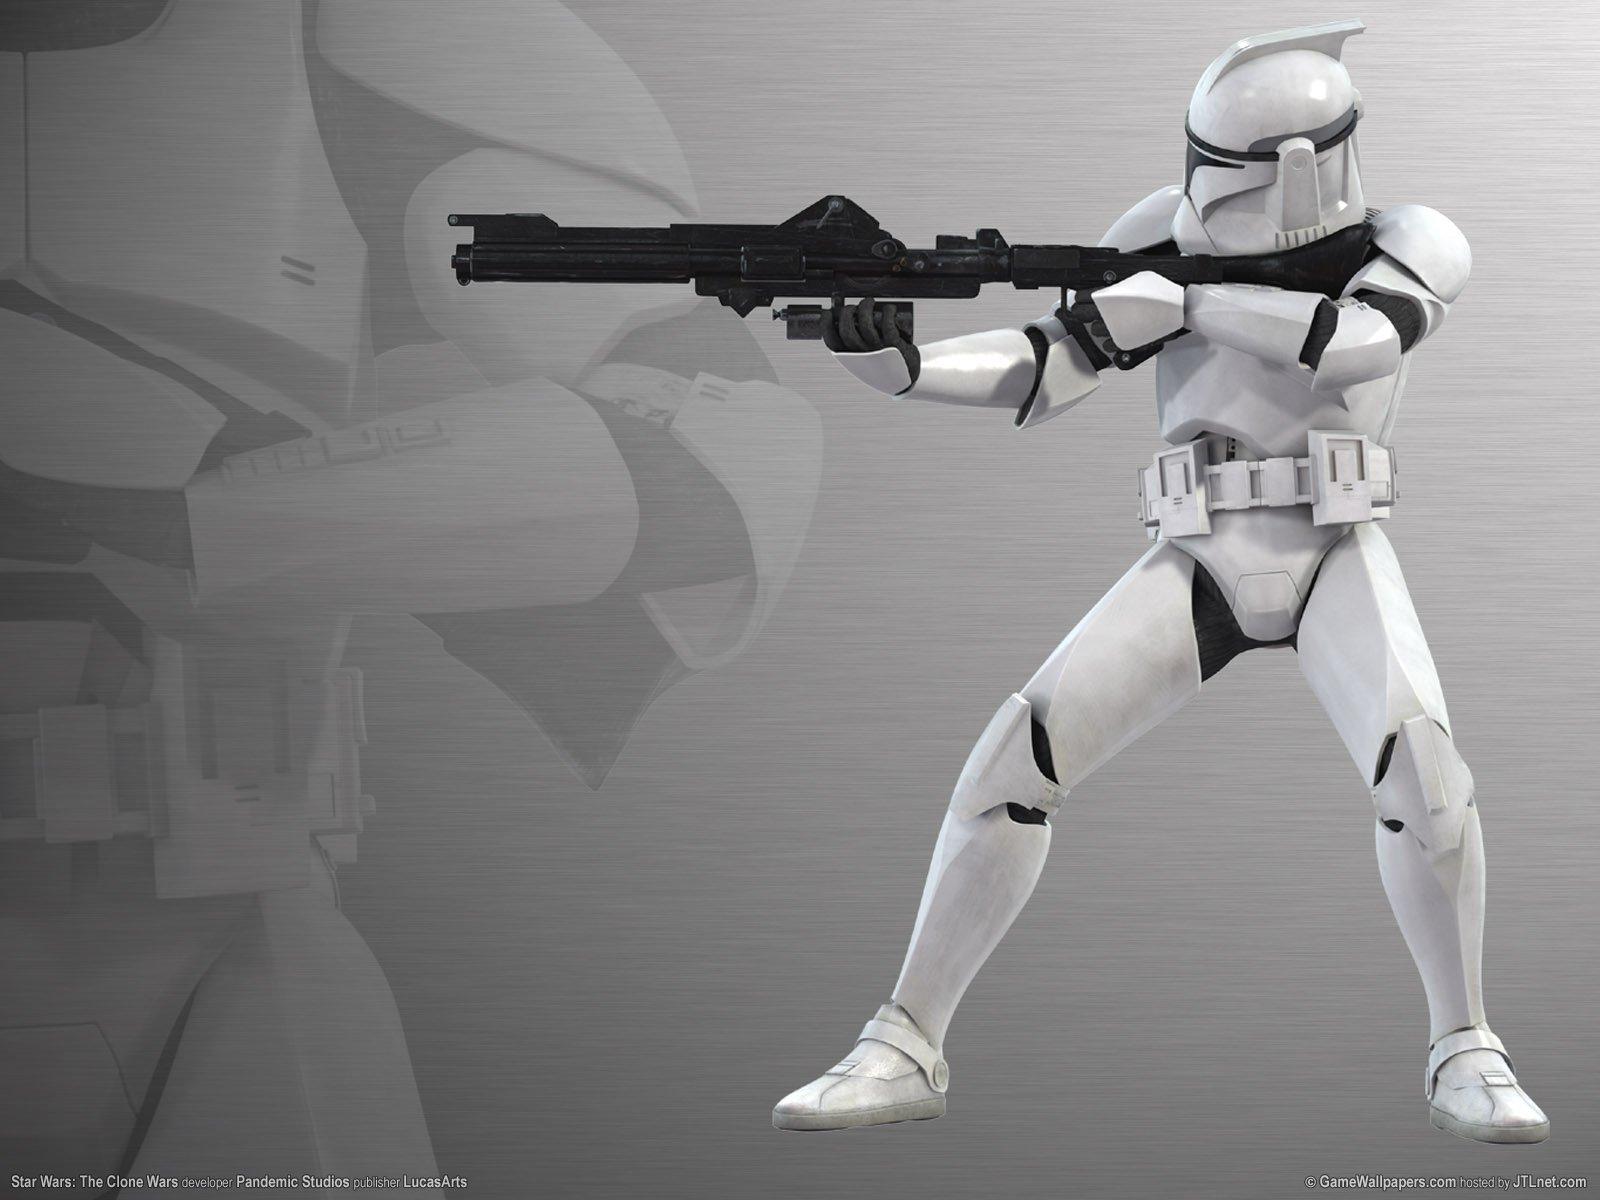 Star Wars Clone Wars Animation Sci Fi Cartoon Futuristic Television Clones Series 34 Wallpaper 1600x1200 256222 Wallpaperup